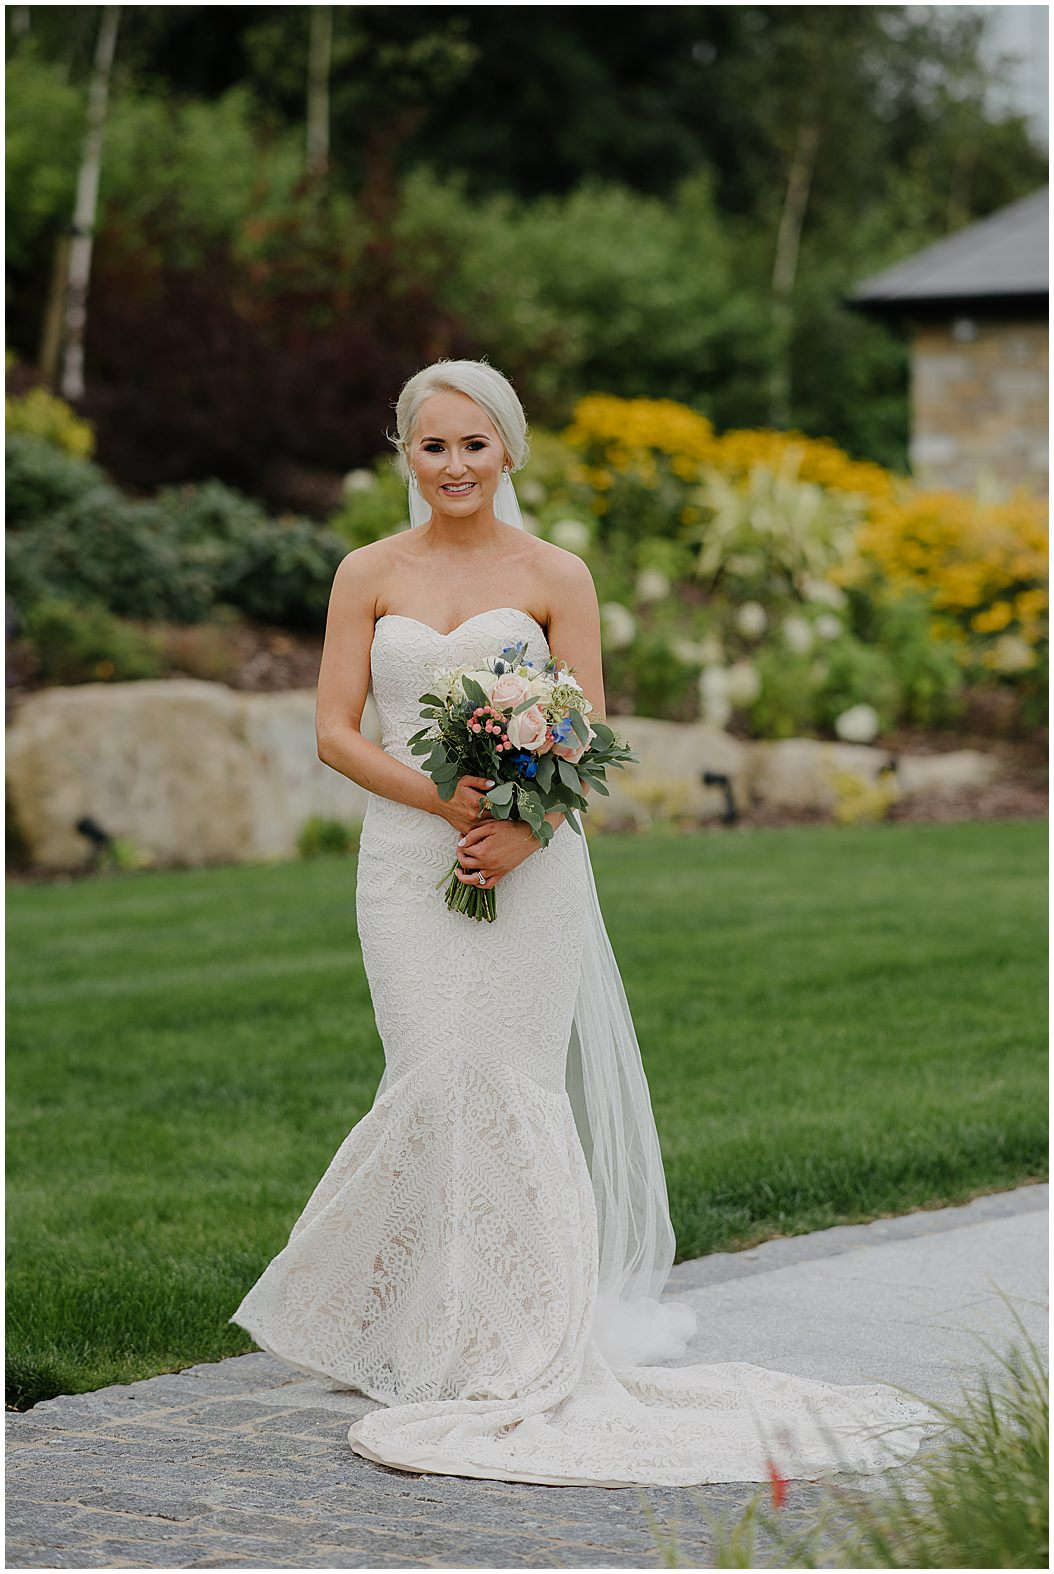 tempo-manor-wedding-jude-browne-photography_0127.jpg